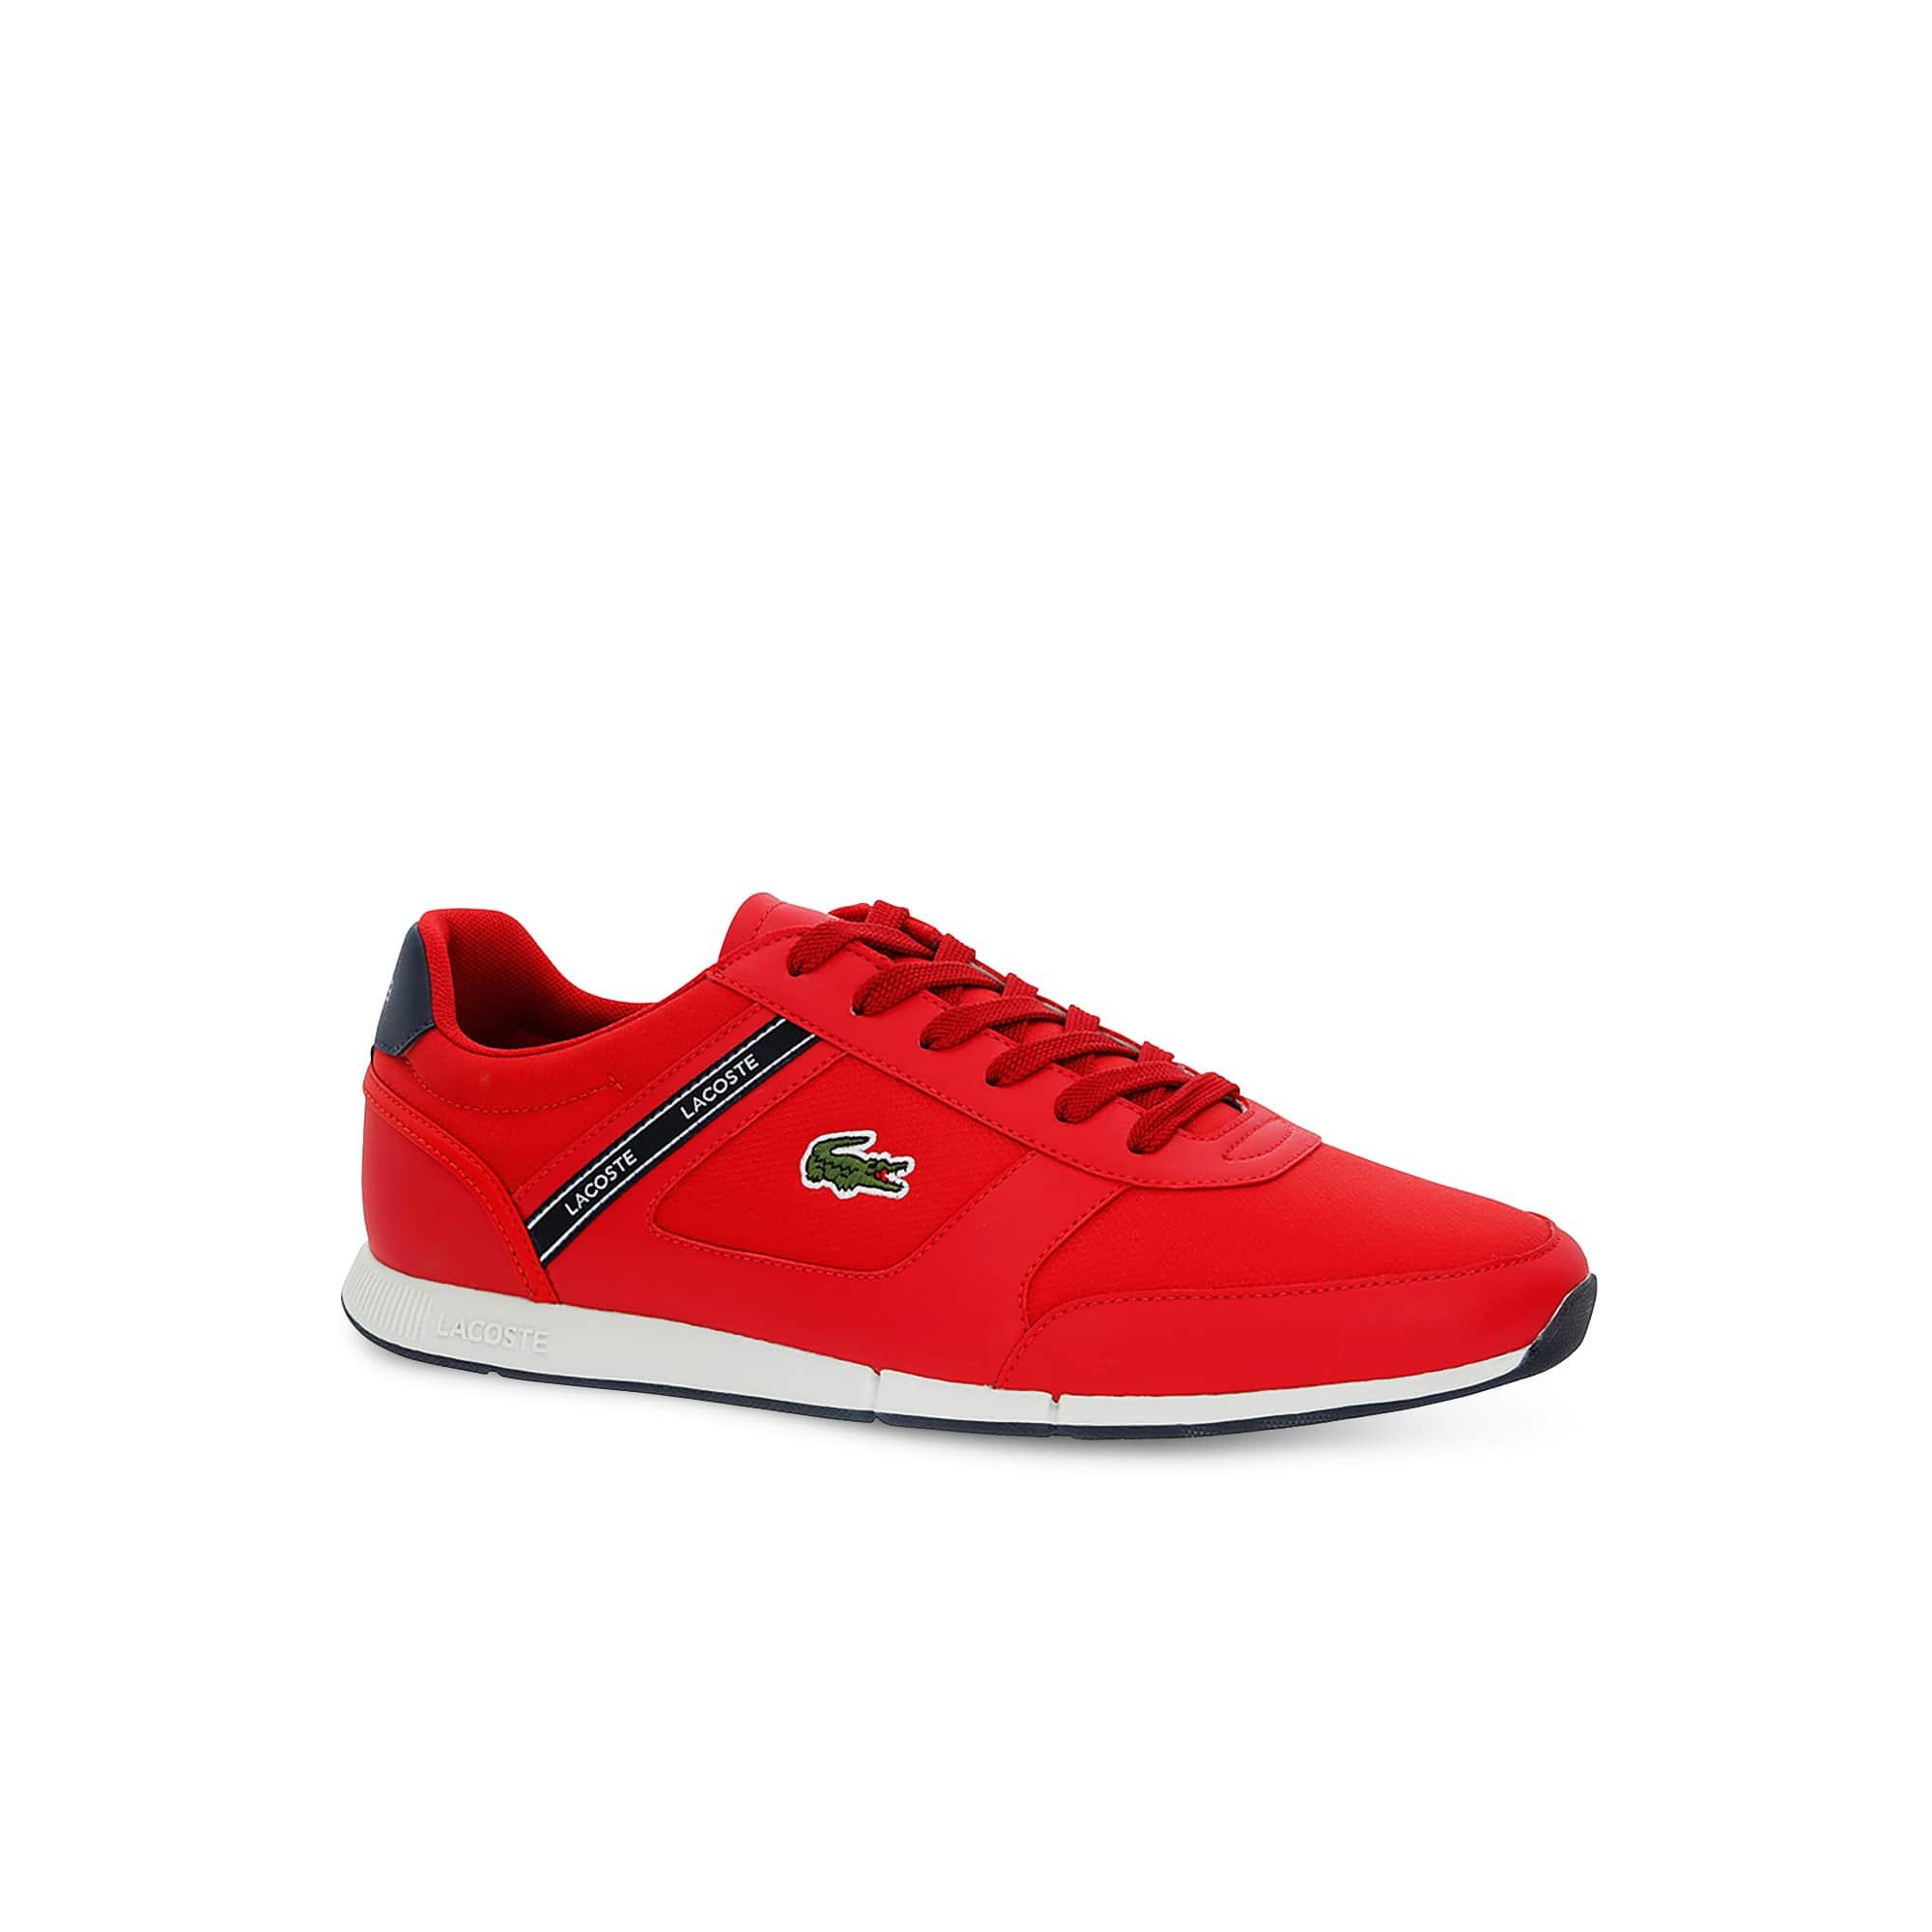 dd52d70bbb7013 Men s Menerva Sport Synthetic Sneakers